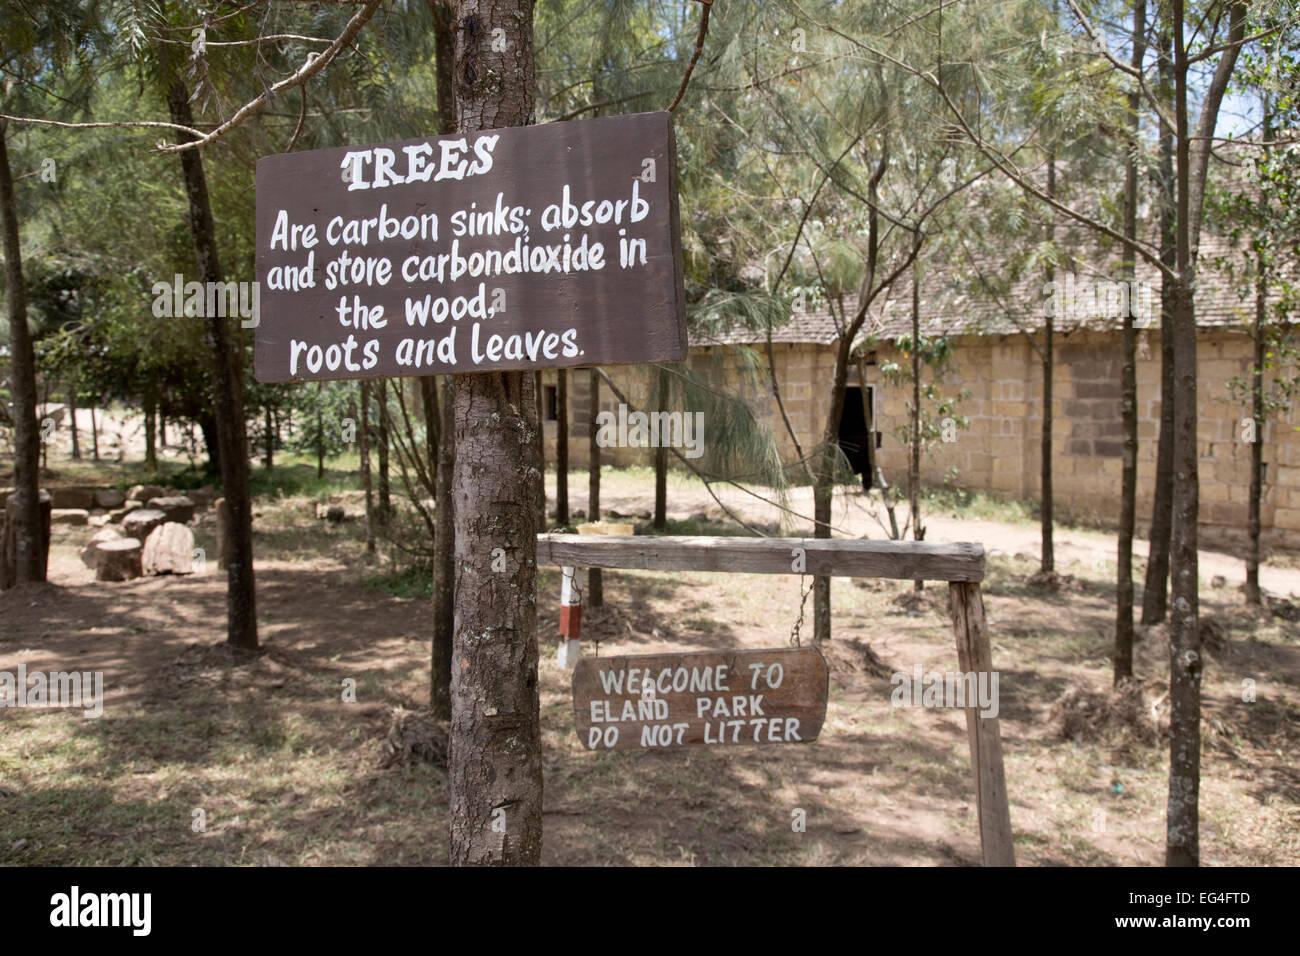 Notice trees absorb carbon dioxide Lungalunga Primary School Gilgil Kenya - Stock Image